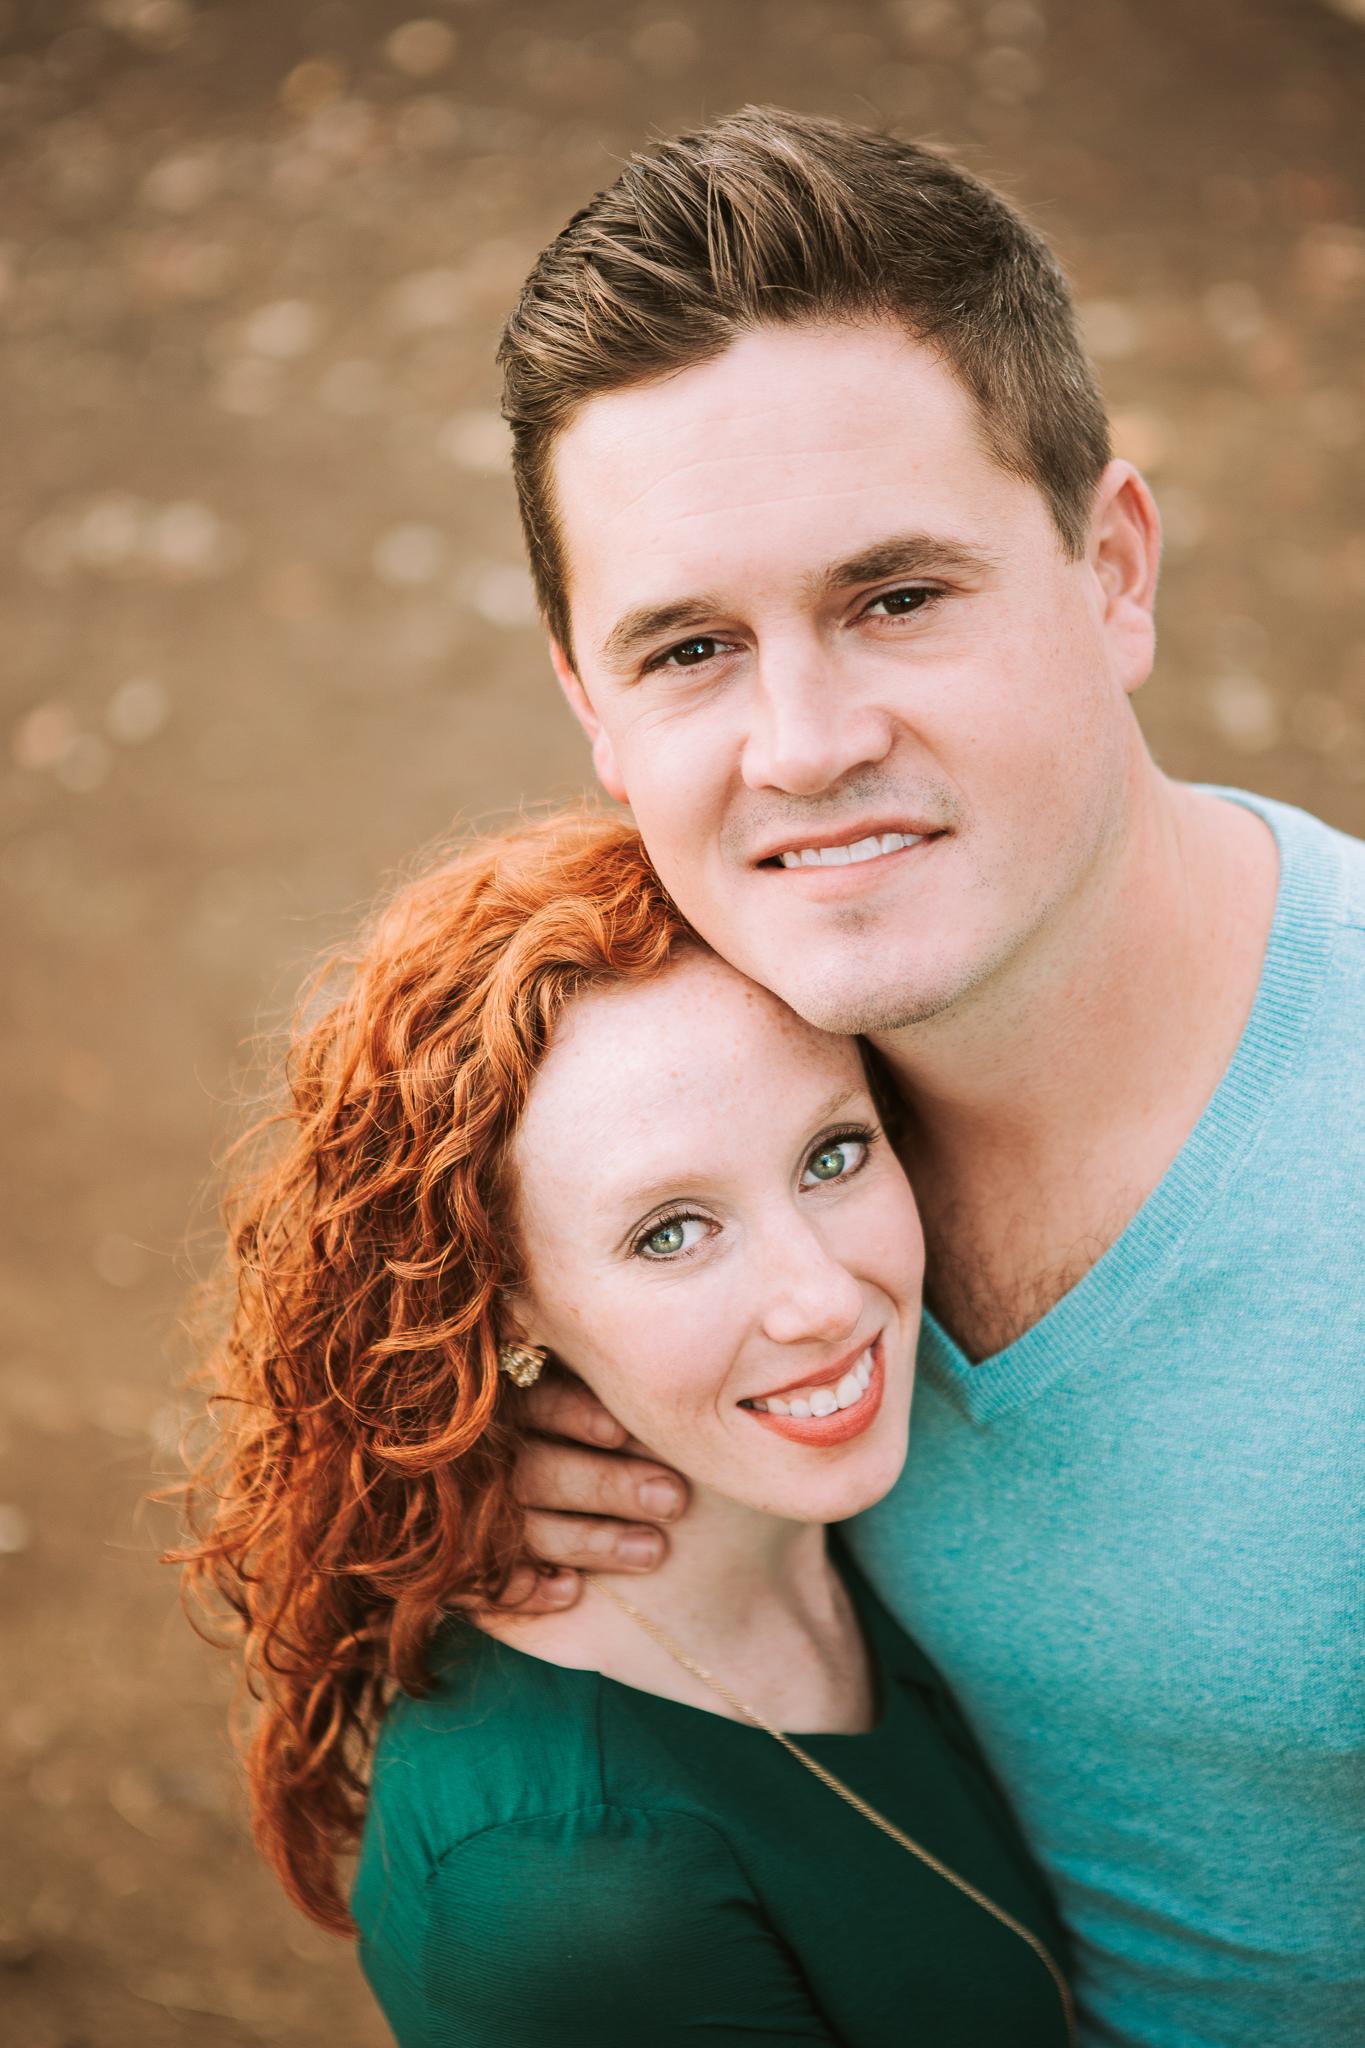 Richmond Kentucky Engagement Photographer - Ariana Jordan Photography -37.jpg